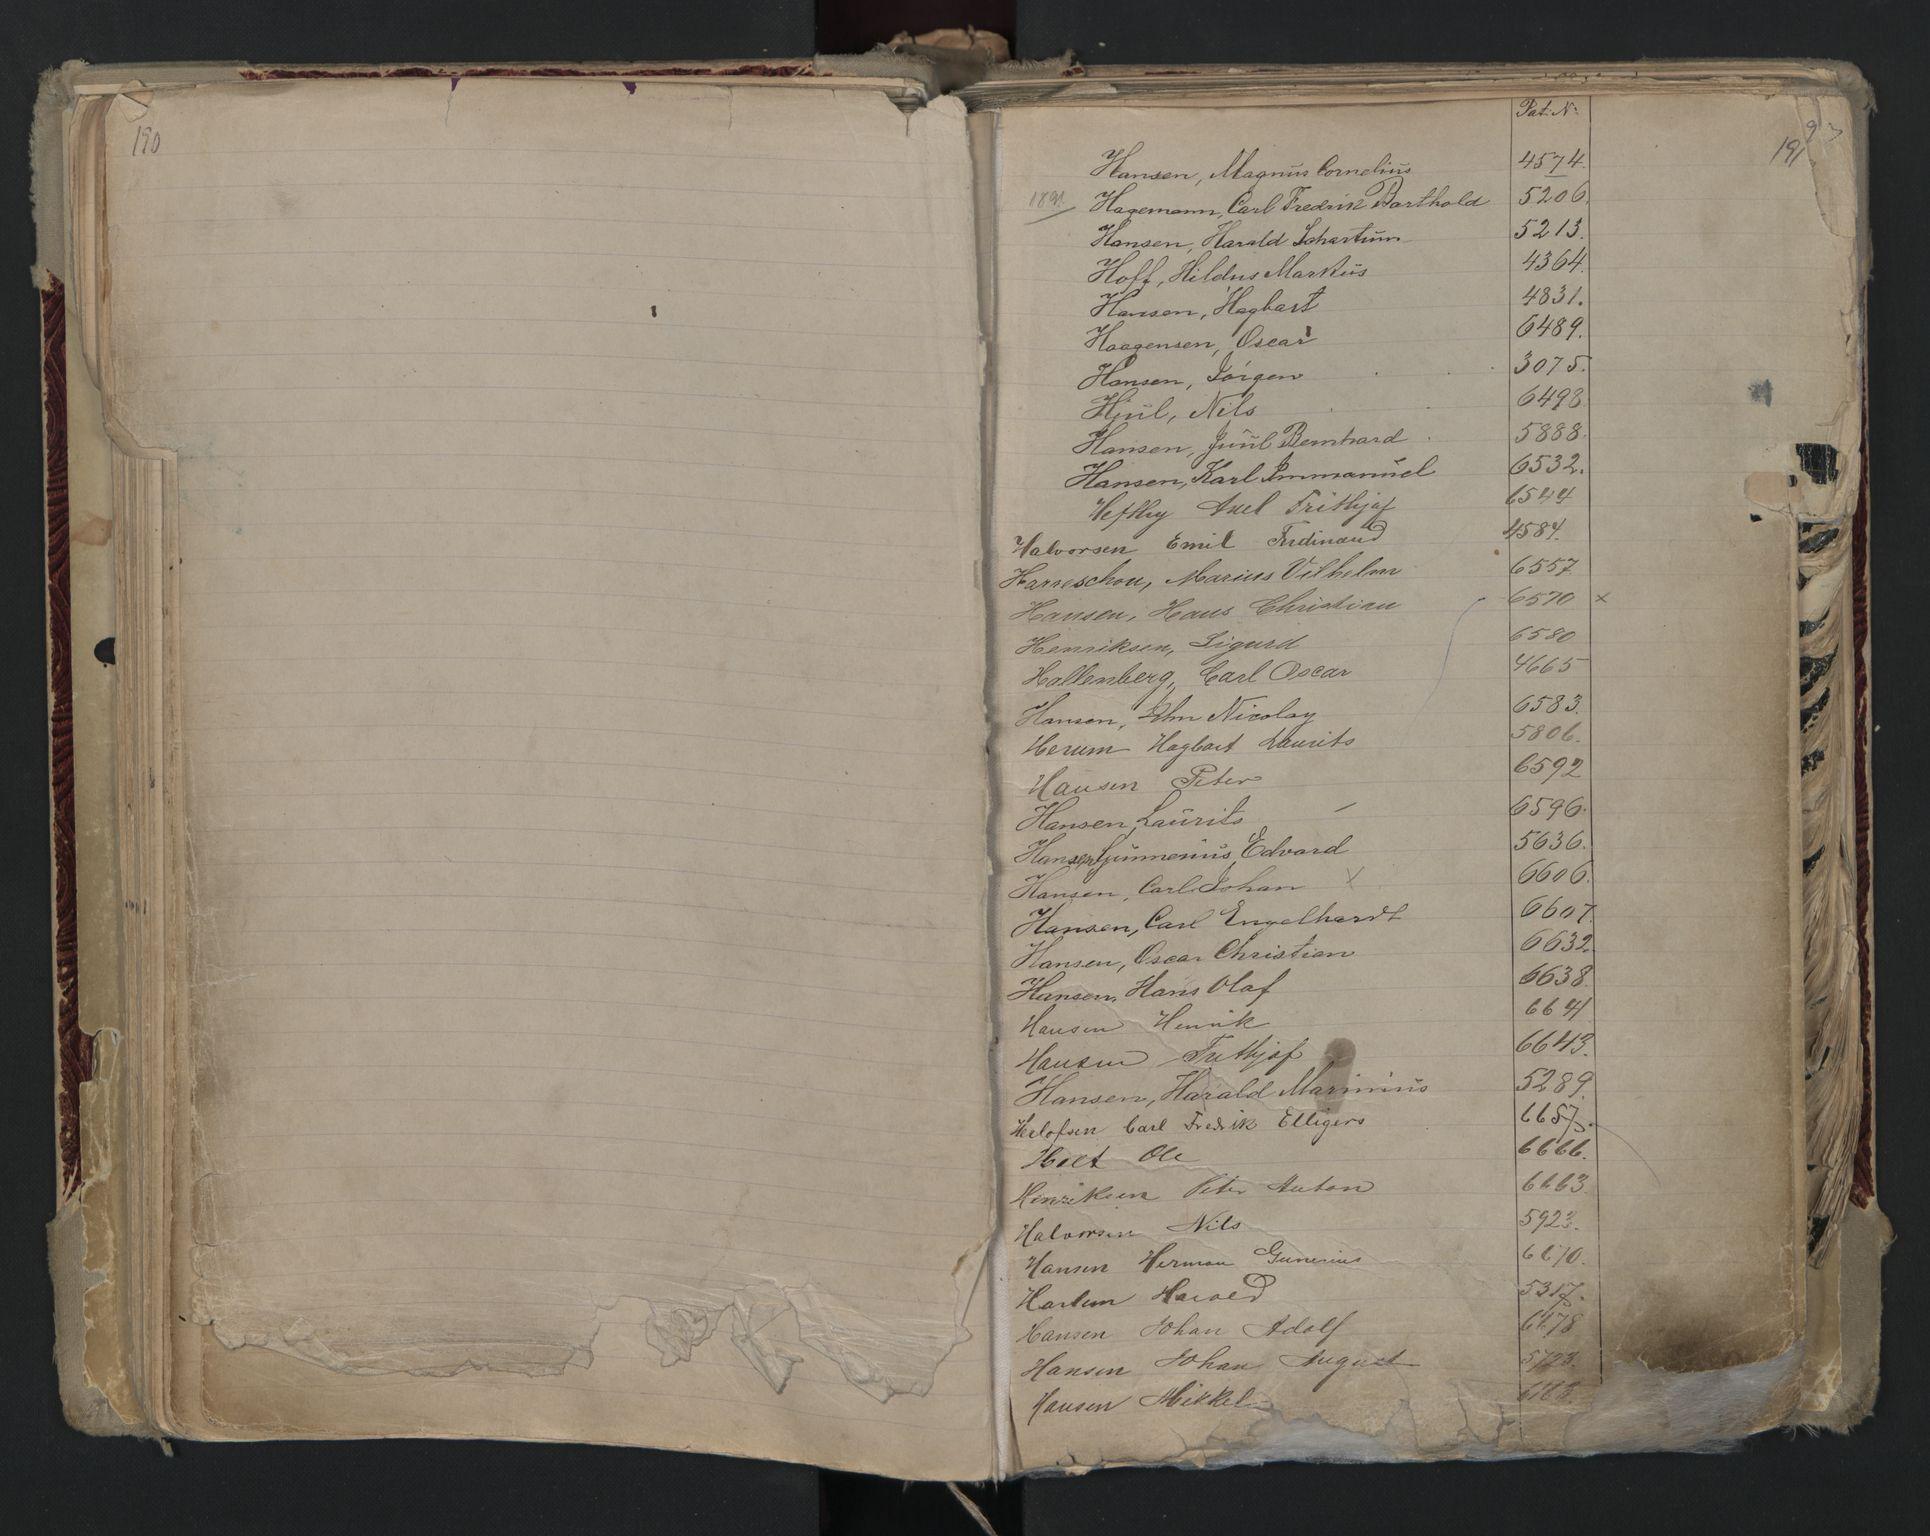 SAO, Oslo sjømannskontor, F/Fa/L0002: Register for Kristiania krets, 1866-1930, s. 190-191